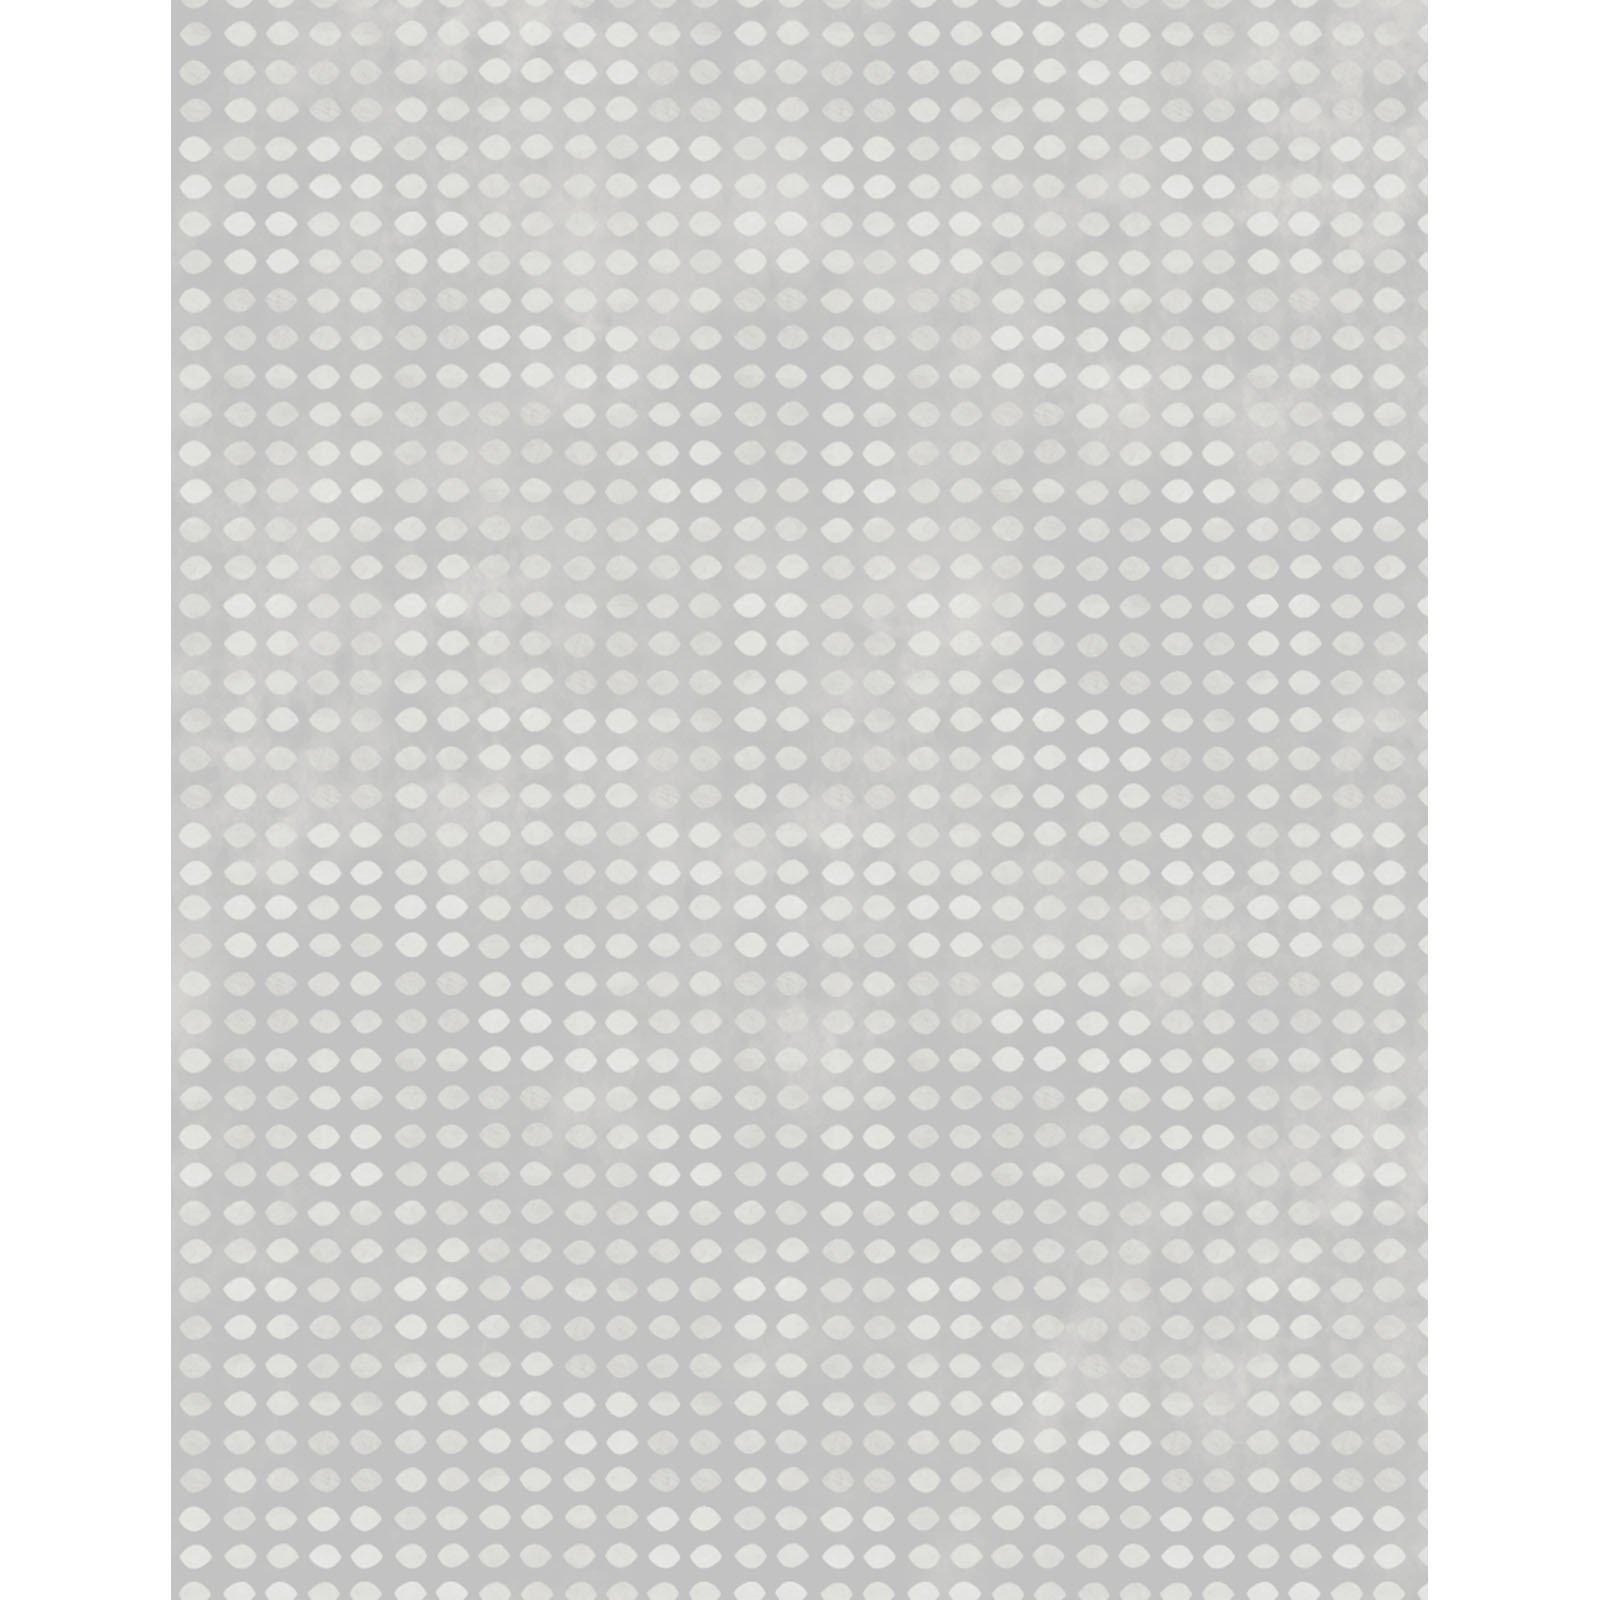 24 Dit Dot - Fog<br/>In The Beginning 8AH-24